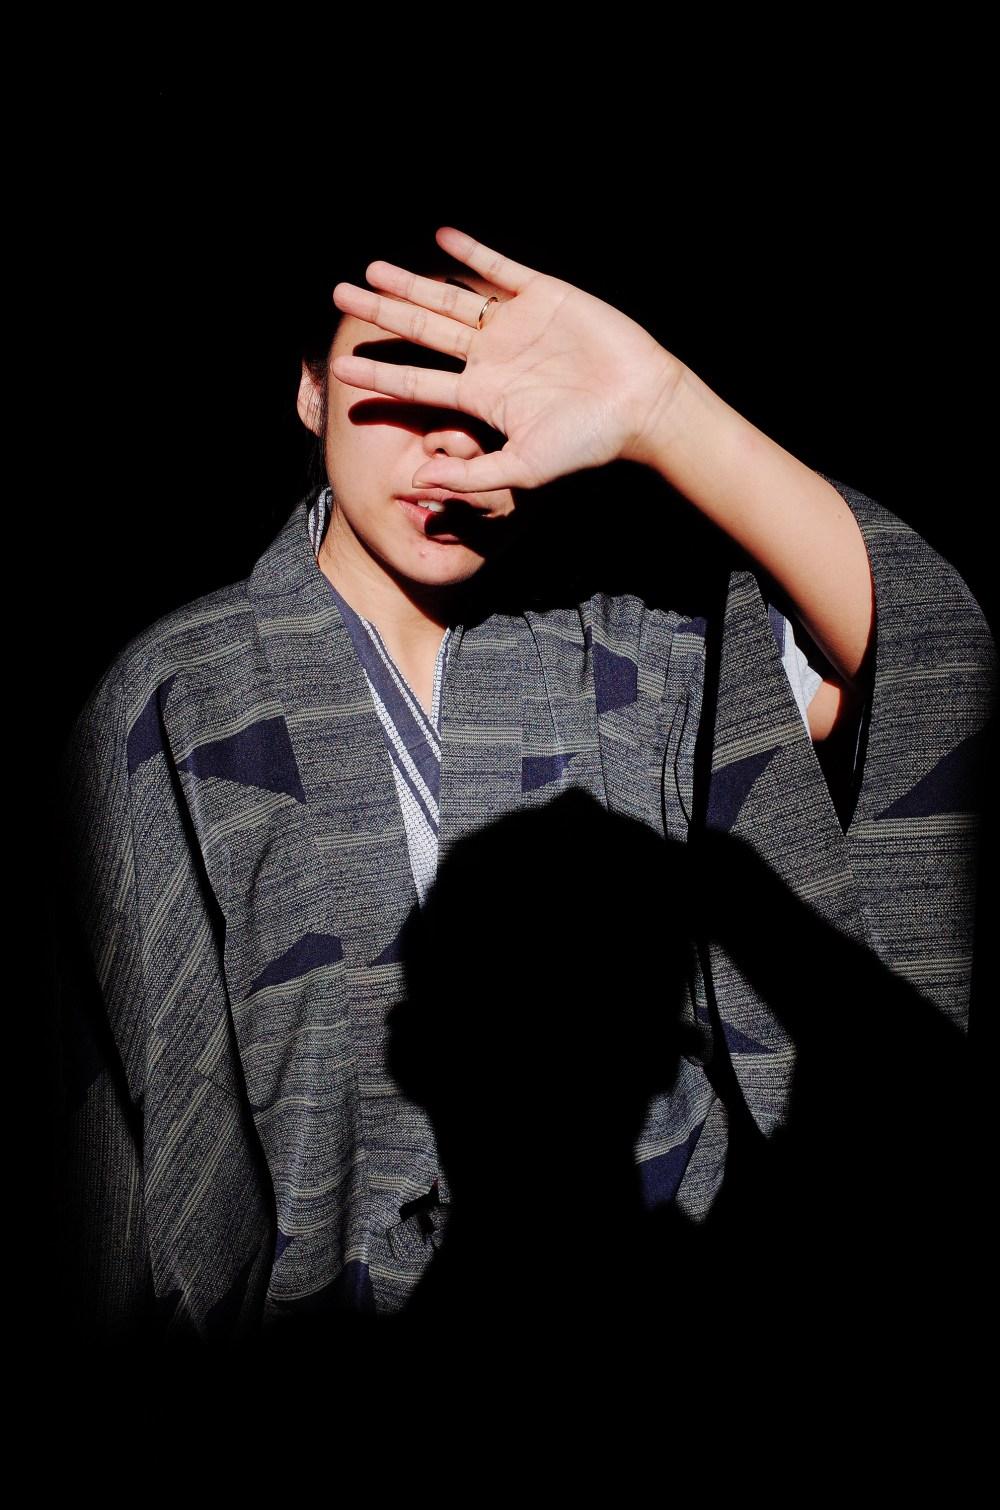 Cindy hand shadow, selfie. Kyoto, uji